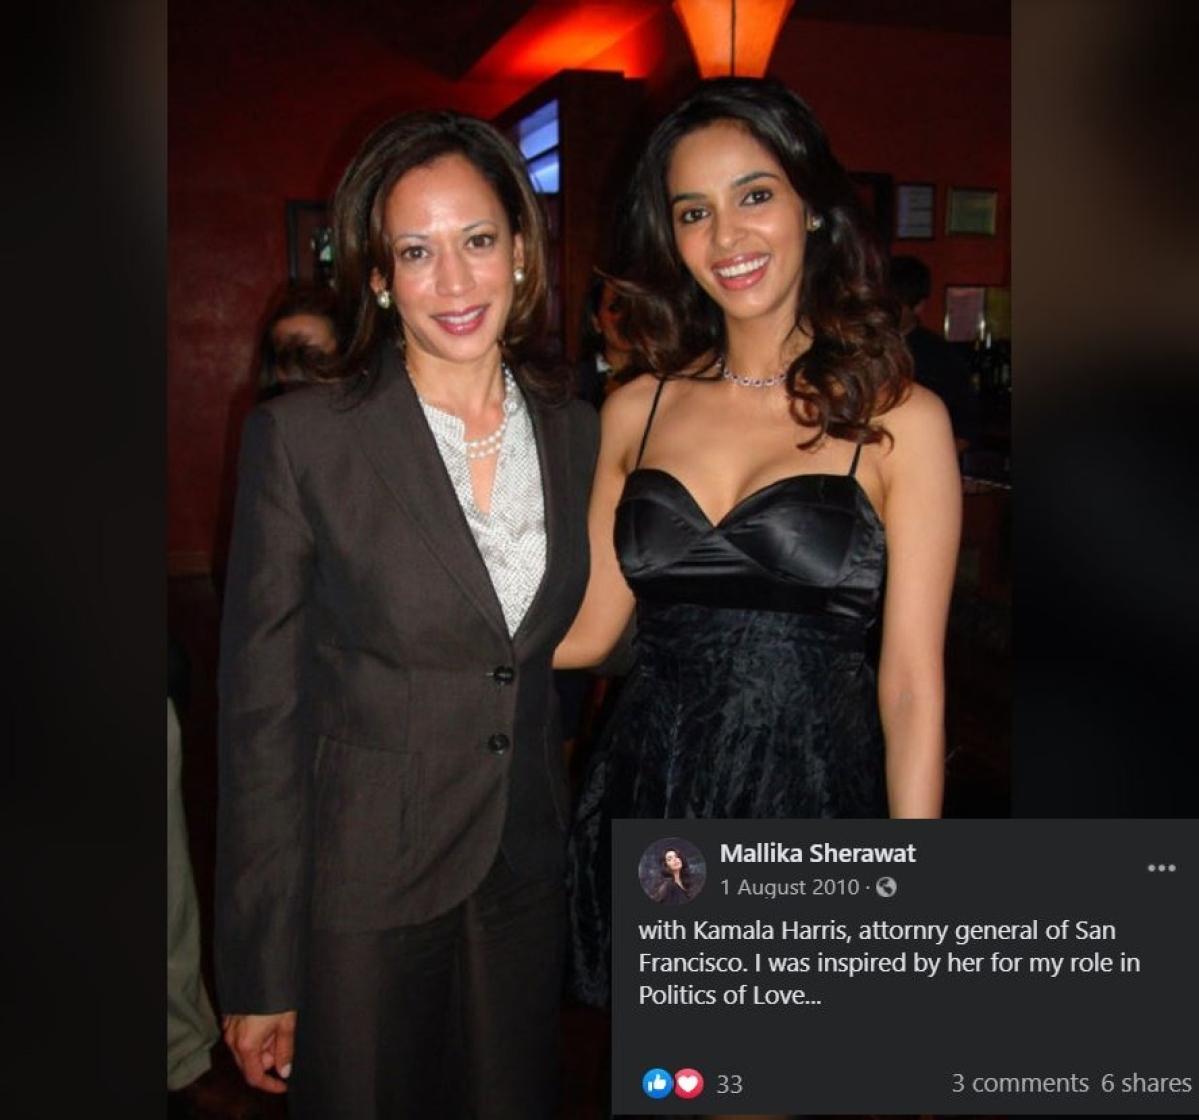 When Mallika Sherawat met Kamala Harris - old posts by the actor go viral